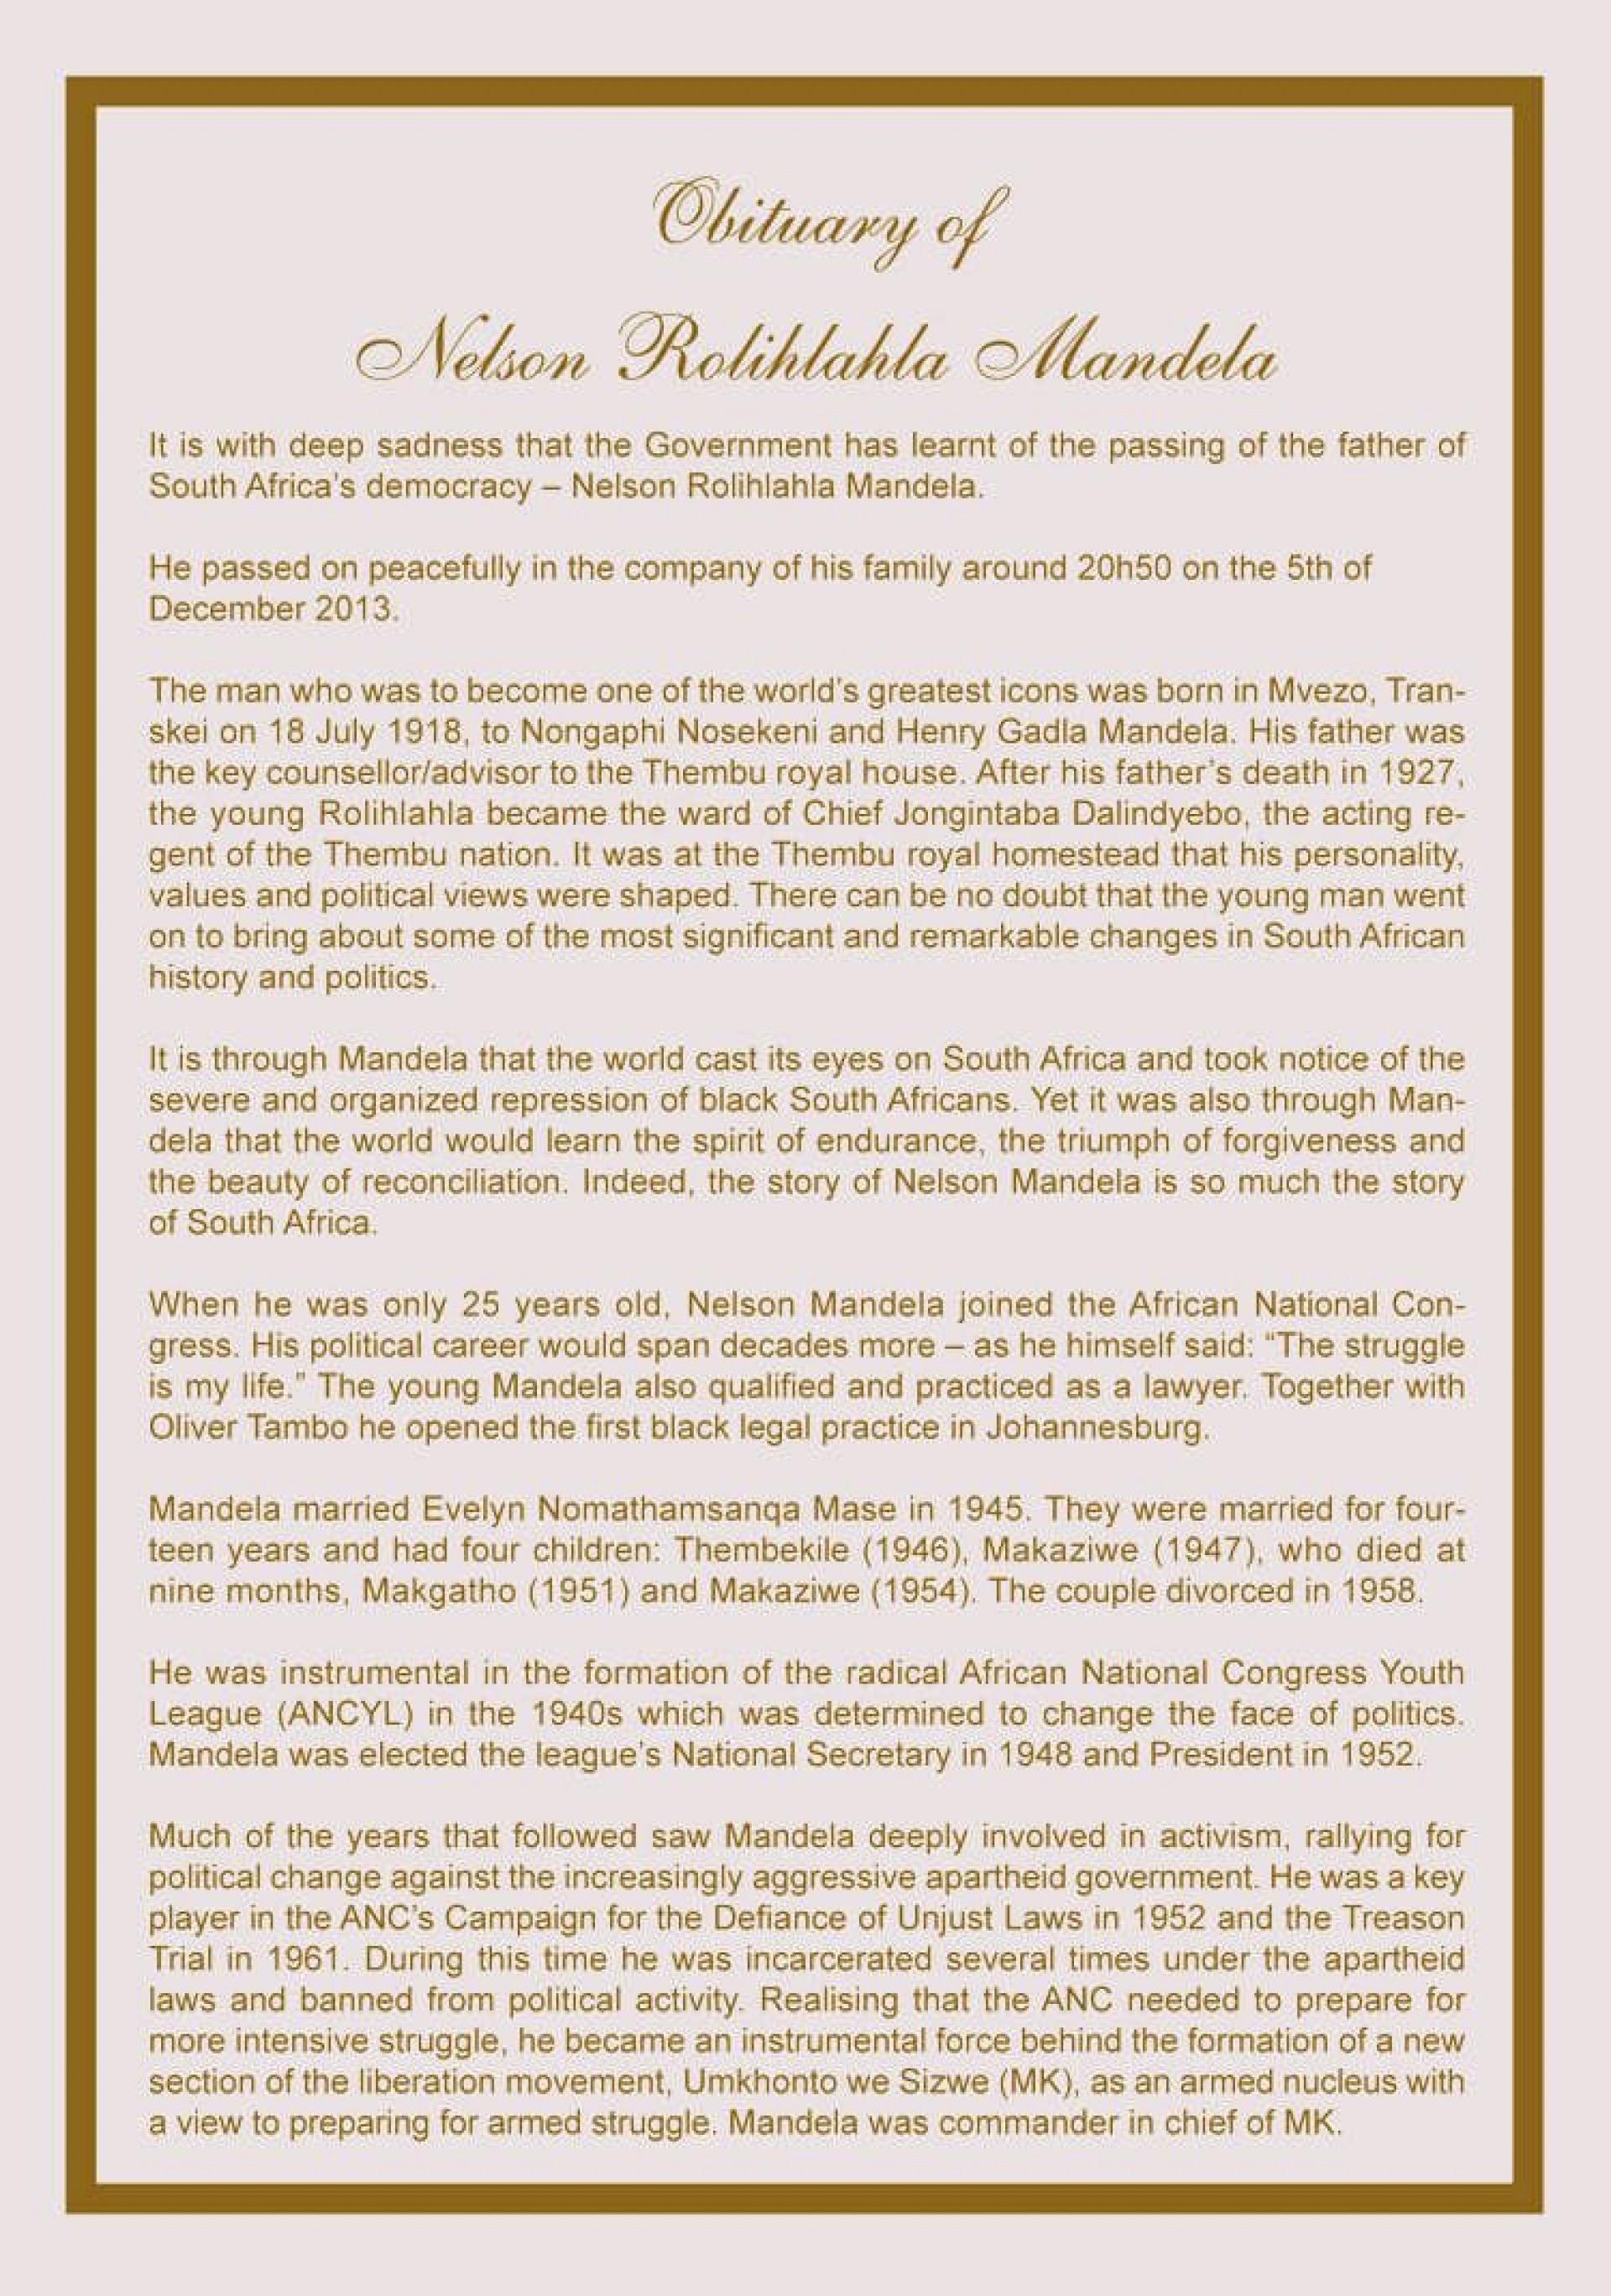 003 Fascinating Sample Wording For Funeral Program Highest Quality  Programs1920